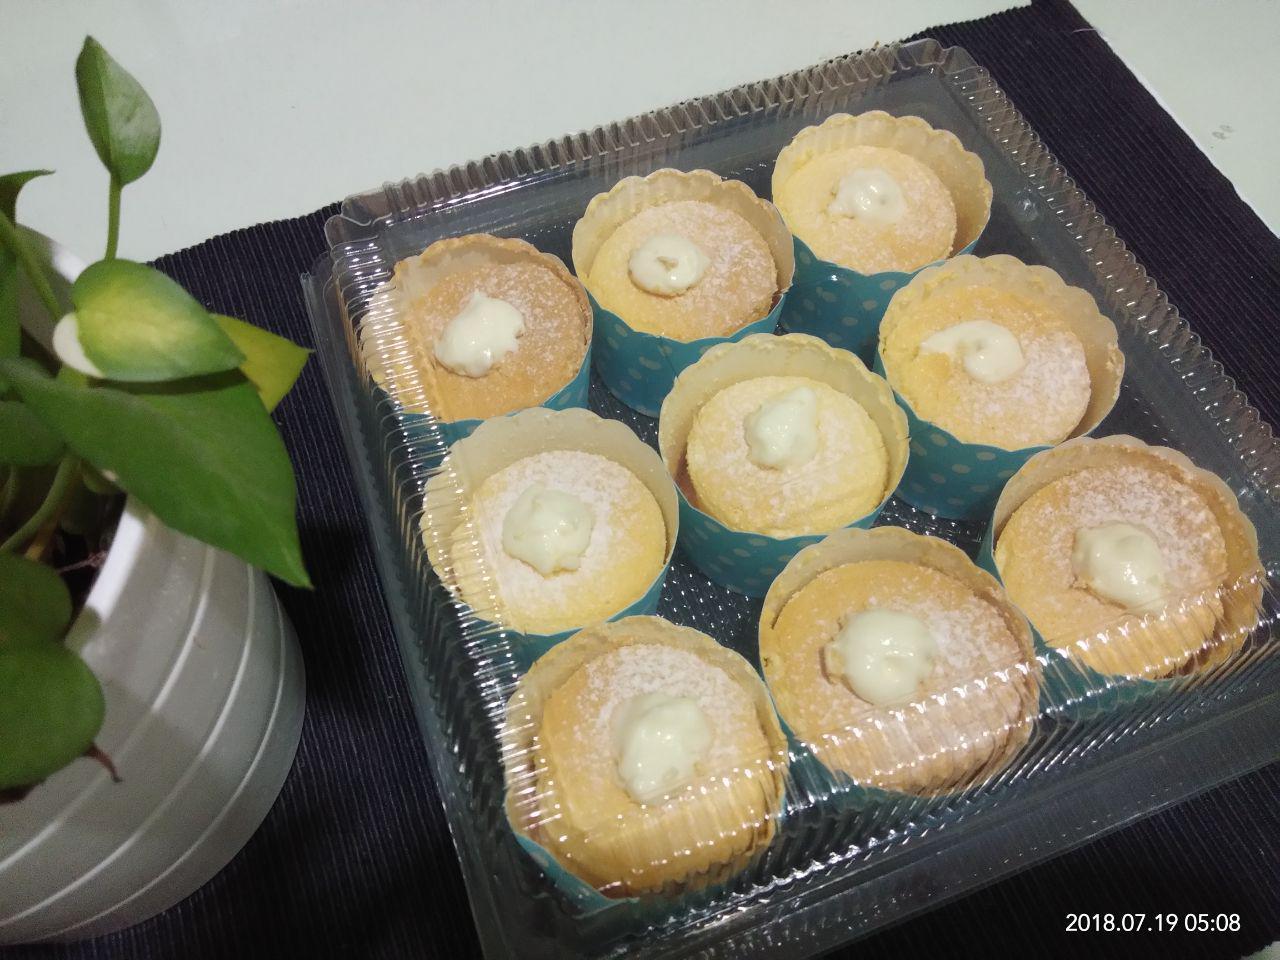 Kek Mangga Azie Kitchen / Resipi Kerabu Mangga Azie Kitchen - Resepi Bergambar : Keki, en